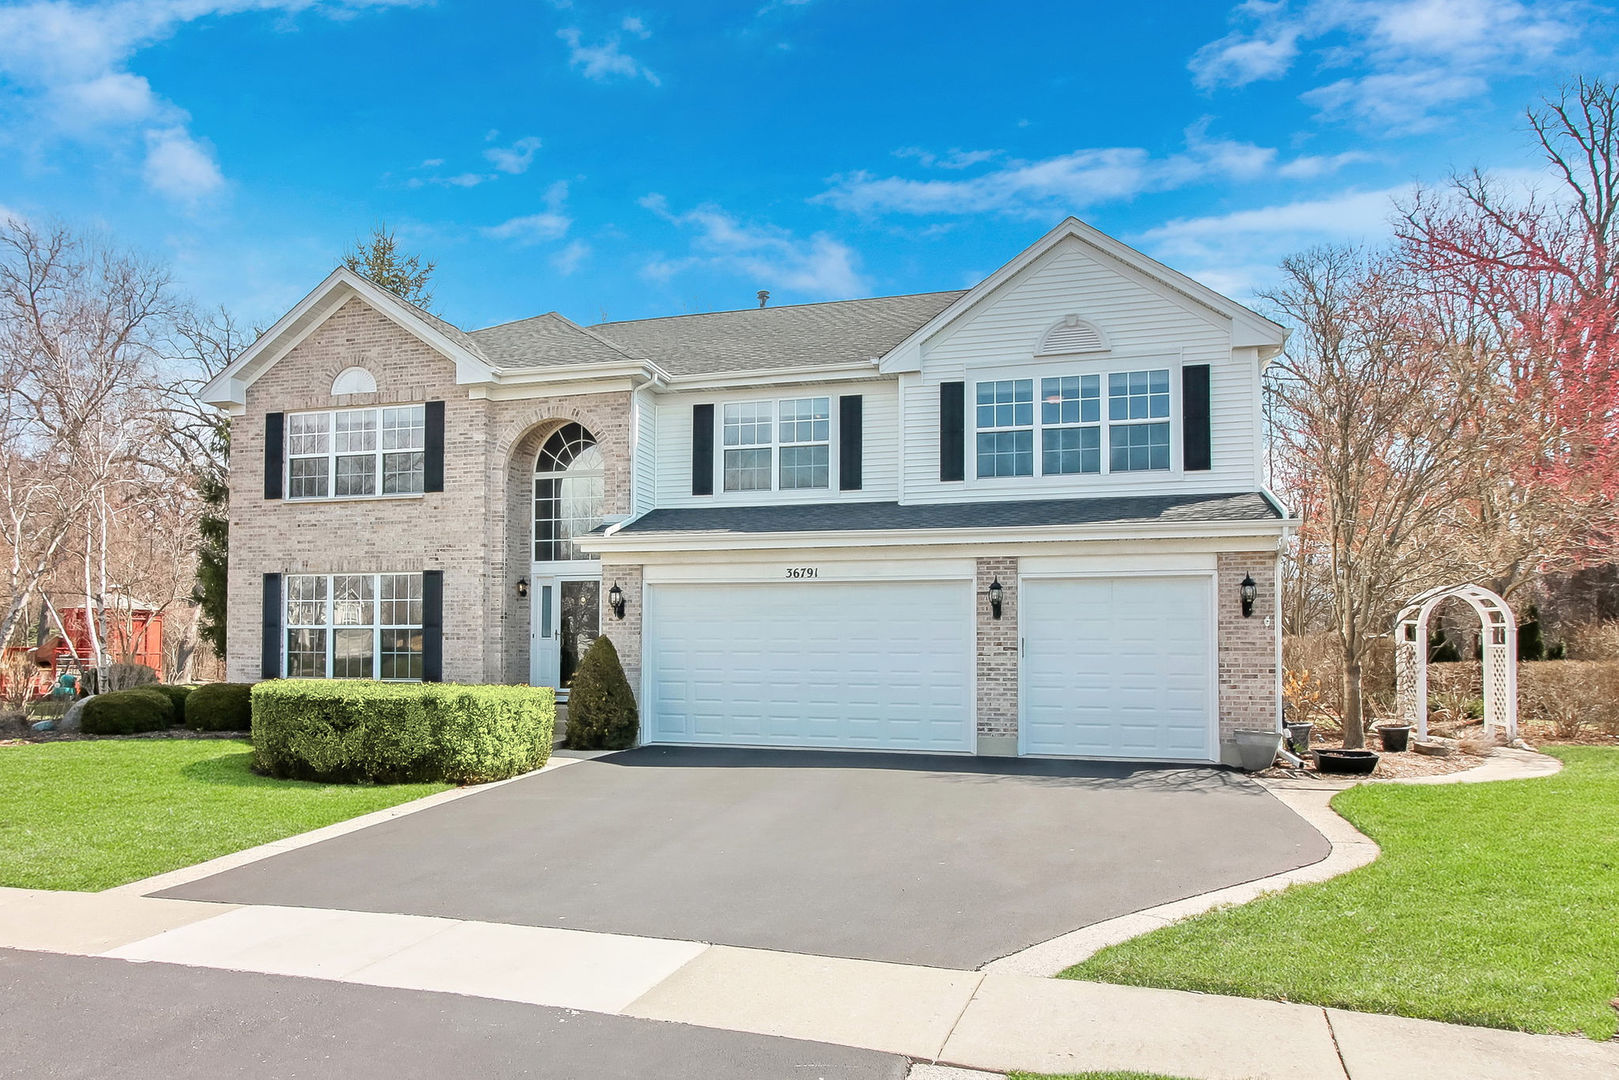 36791 North Yew Tree Drive, Lake Villa, Illinois 60046